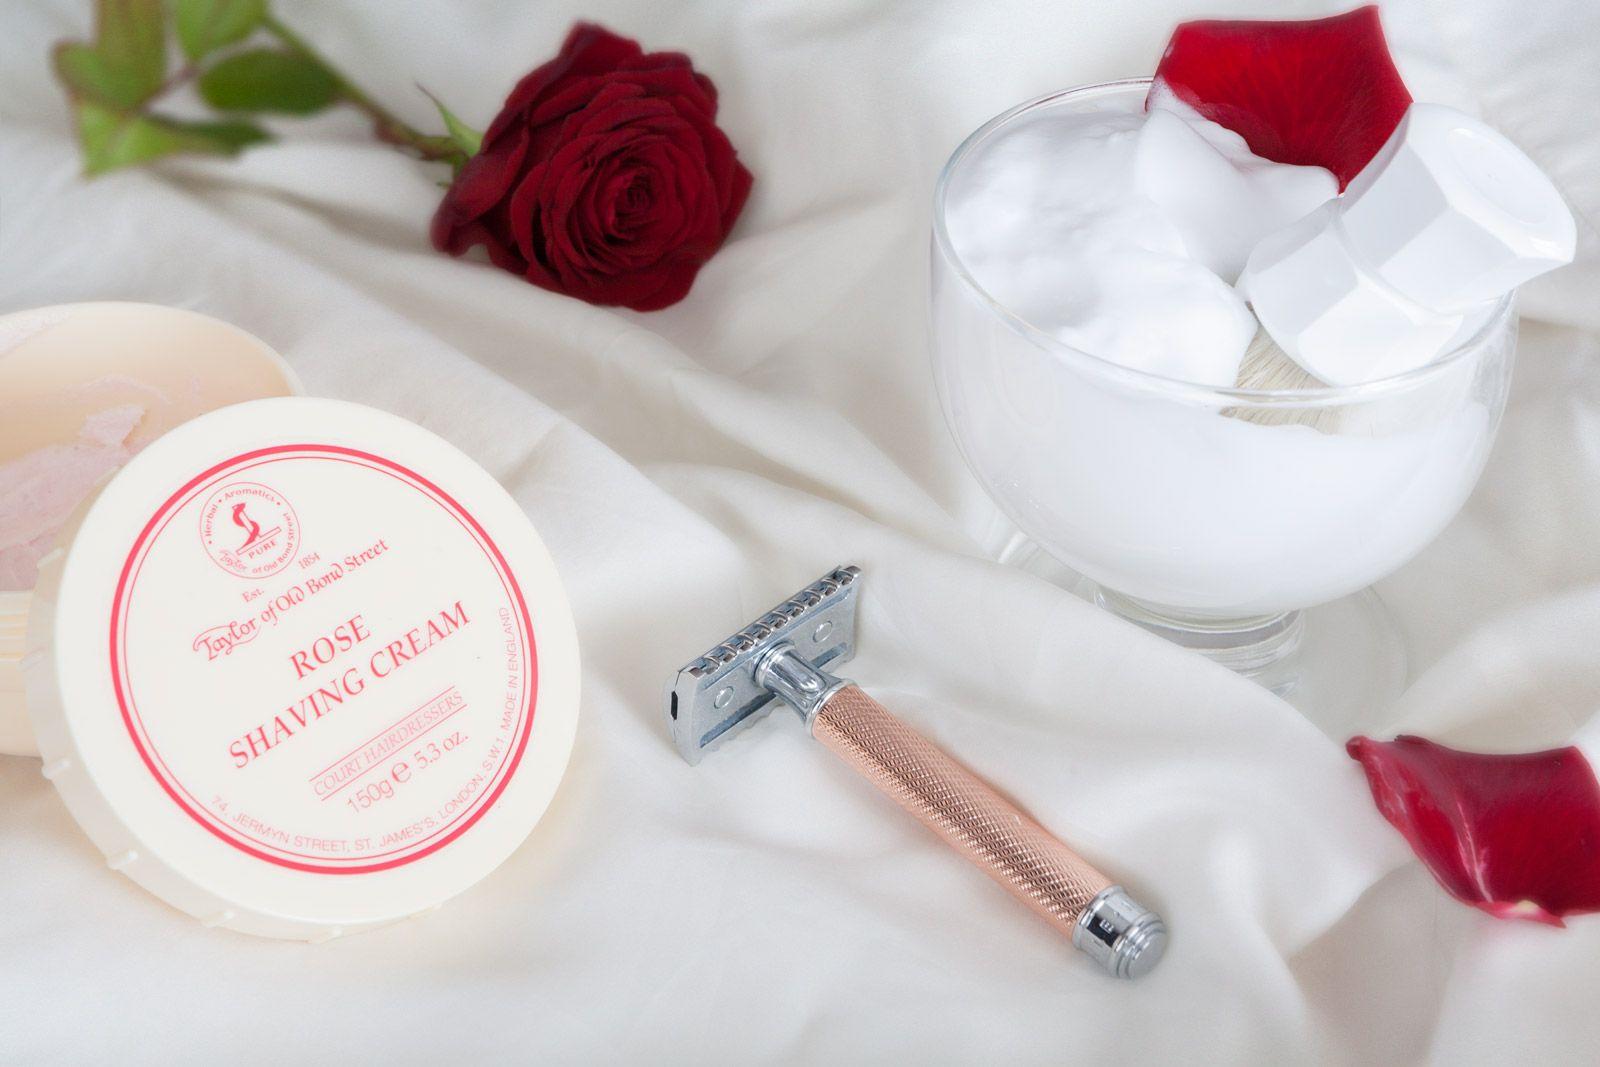 You are currently viewing Taylor of Old Bond Street Rose Shaving Cream – recenzja kremu do golenia